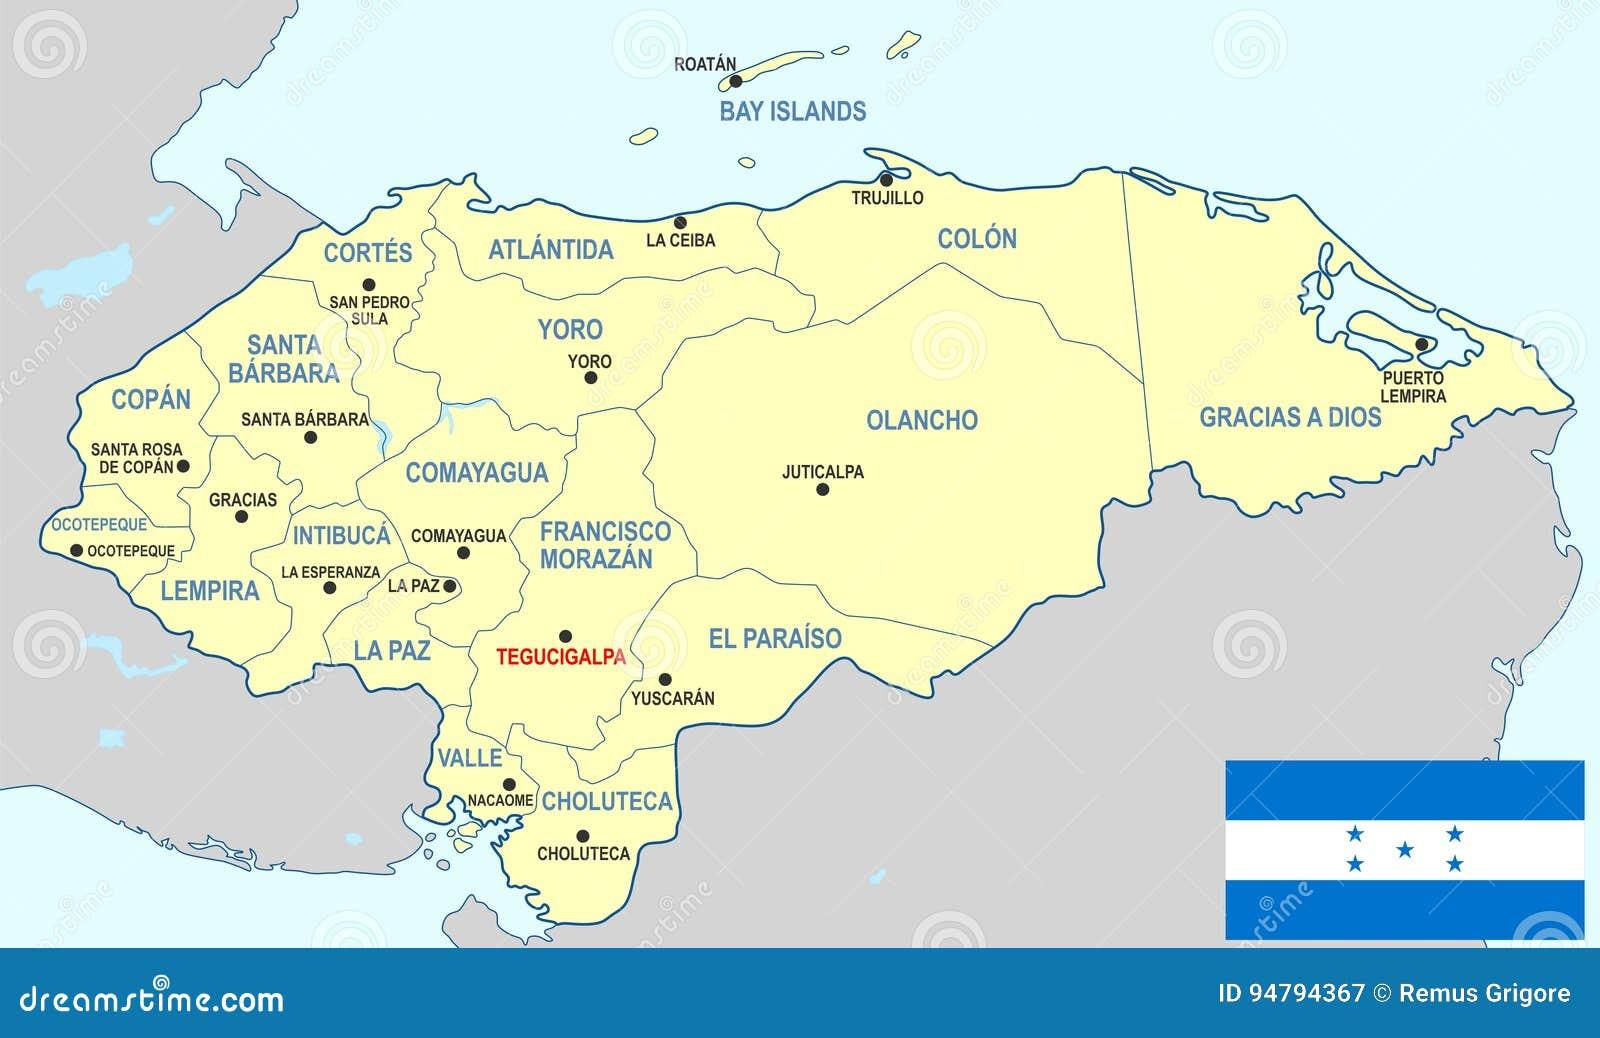 Honduras map - cdr format stock vector. Illustration of flag ... on map of san bernardino county cities, map of oceania cities, map of eastern united states cities, map of s korea cities, map of kosovo cities, map of luxembourg cities, map of rio grande cities, map of palau cities, map of guyana cities, map of ohio showing cities, map of the dominican republic cities, map of western tennessee cities, map of laos cities, map of niger cities, map of mississippi river cities, map of democratic republic of congo cities, map equatorial guinea cities, map of guam cities, map of gulf of california cities, map of burundi cities,